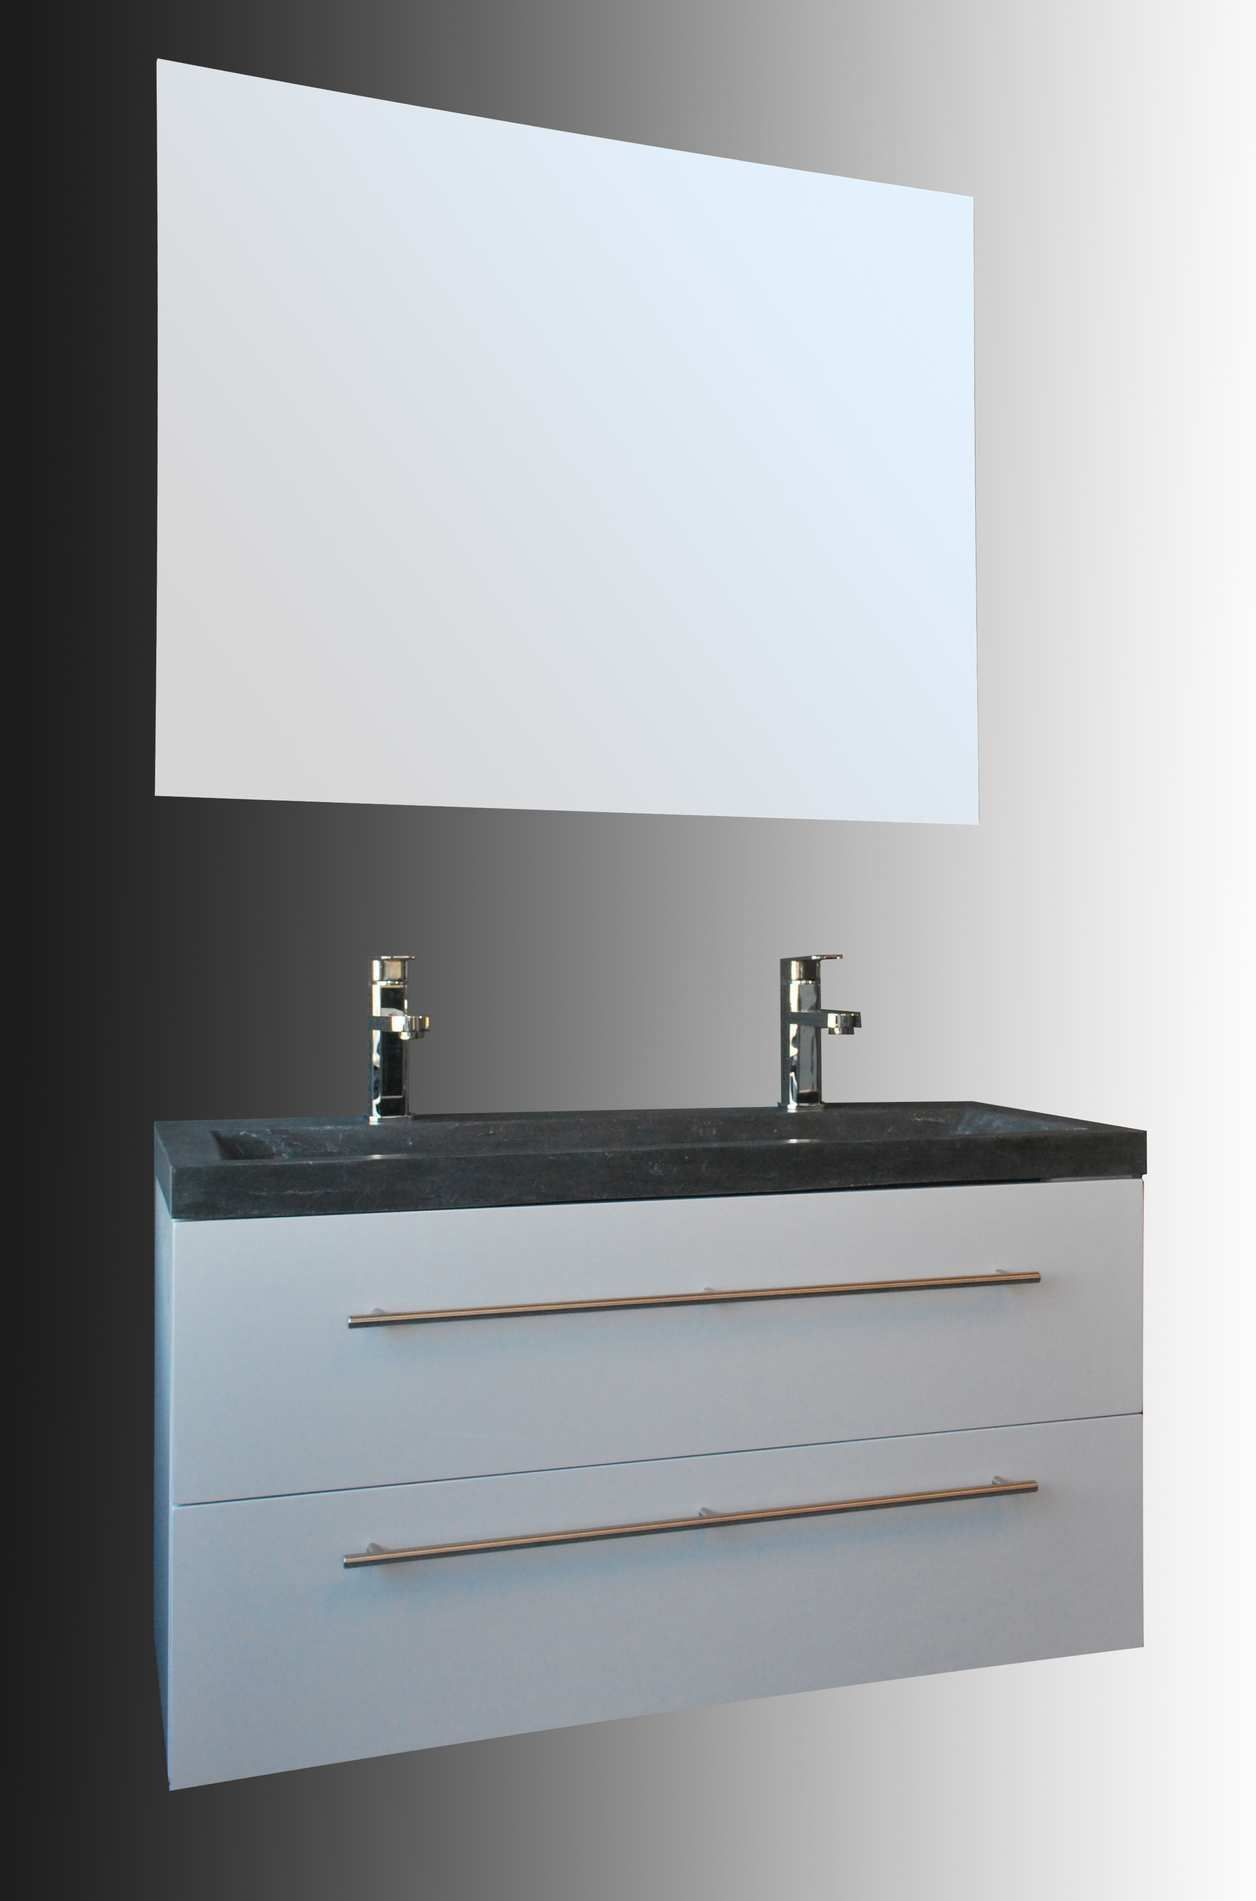 Lambini Designs Compact Stone badkamermeubel hoogglans wit 100cm, 2 kraangaten